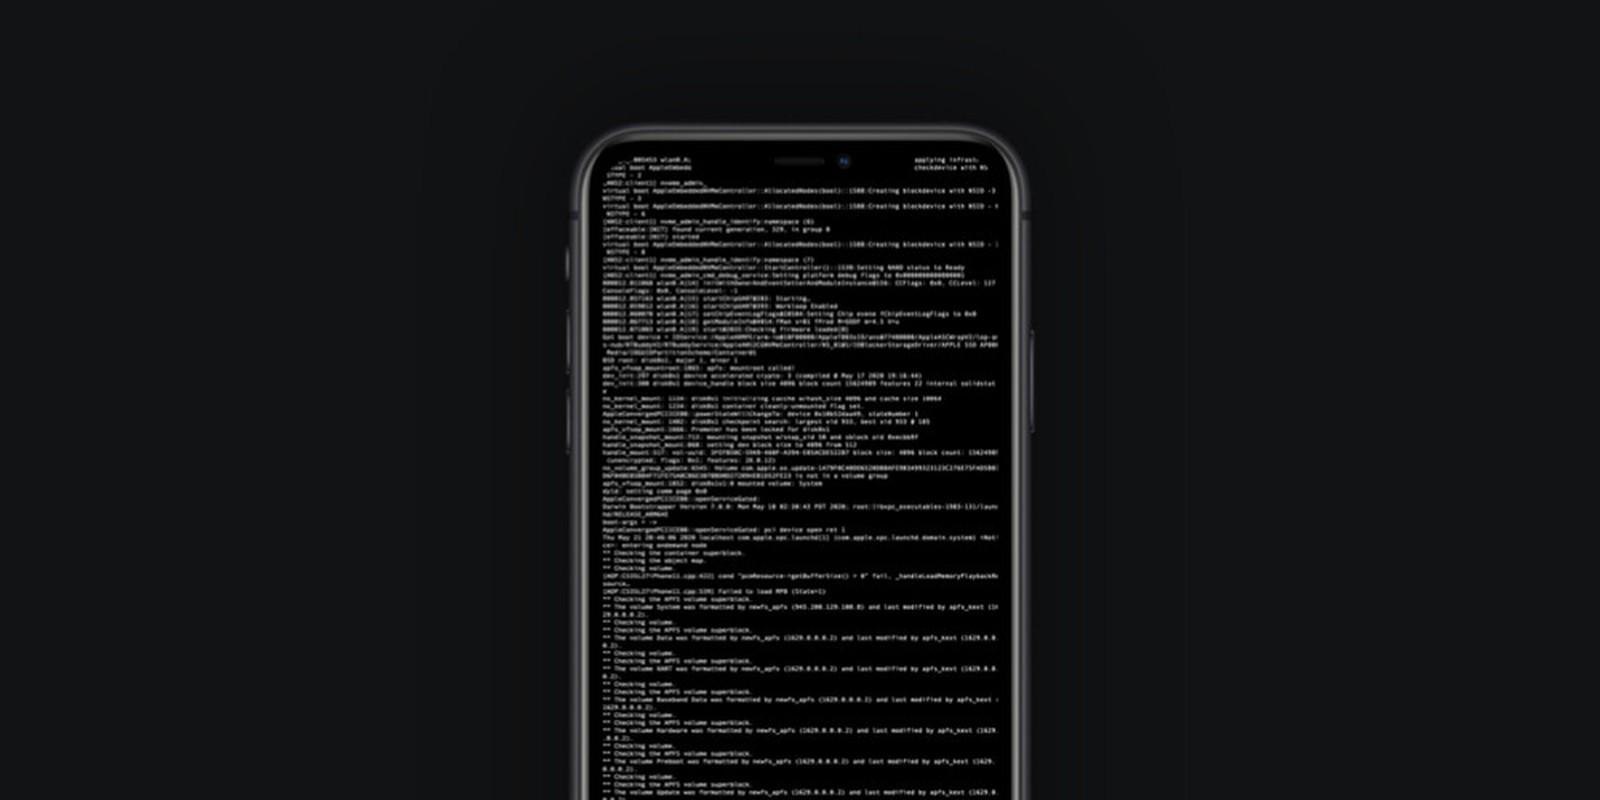 Nhung chiec iPhone dac biet Apple chi cho muon chu... khong ban-Hinh-5